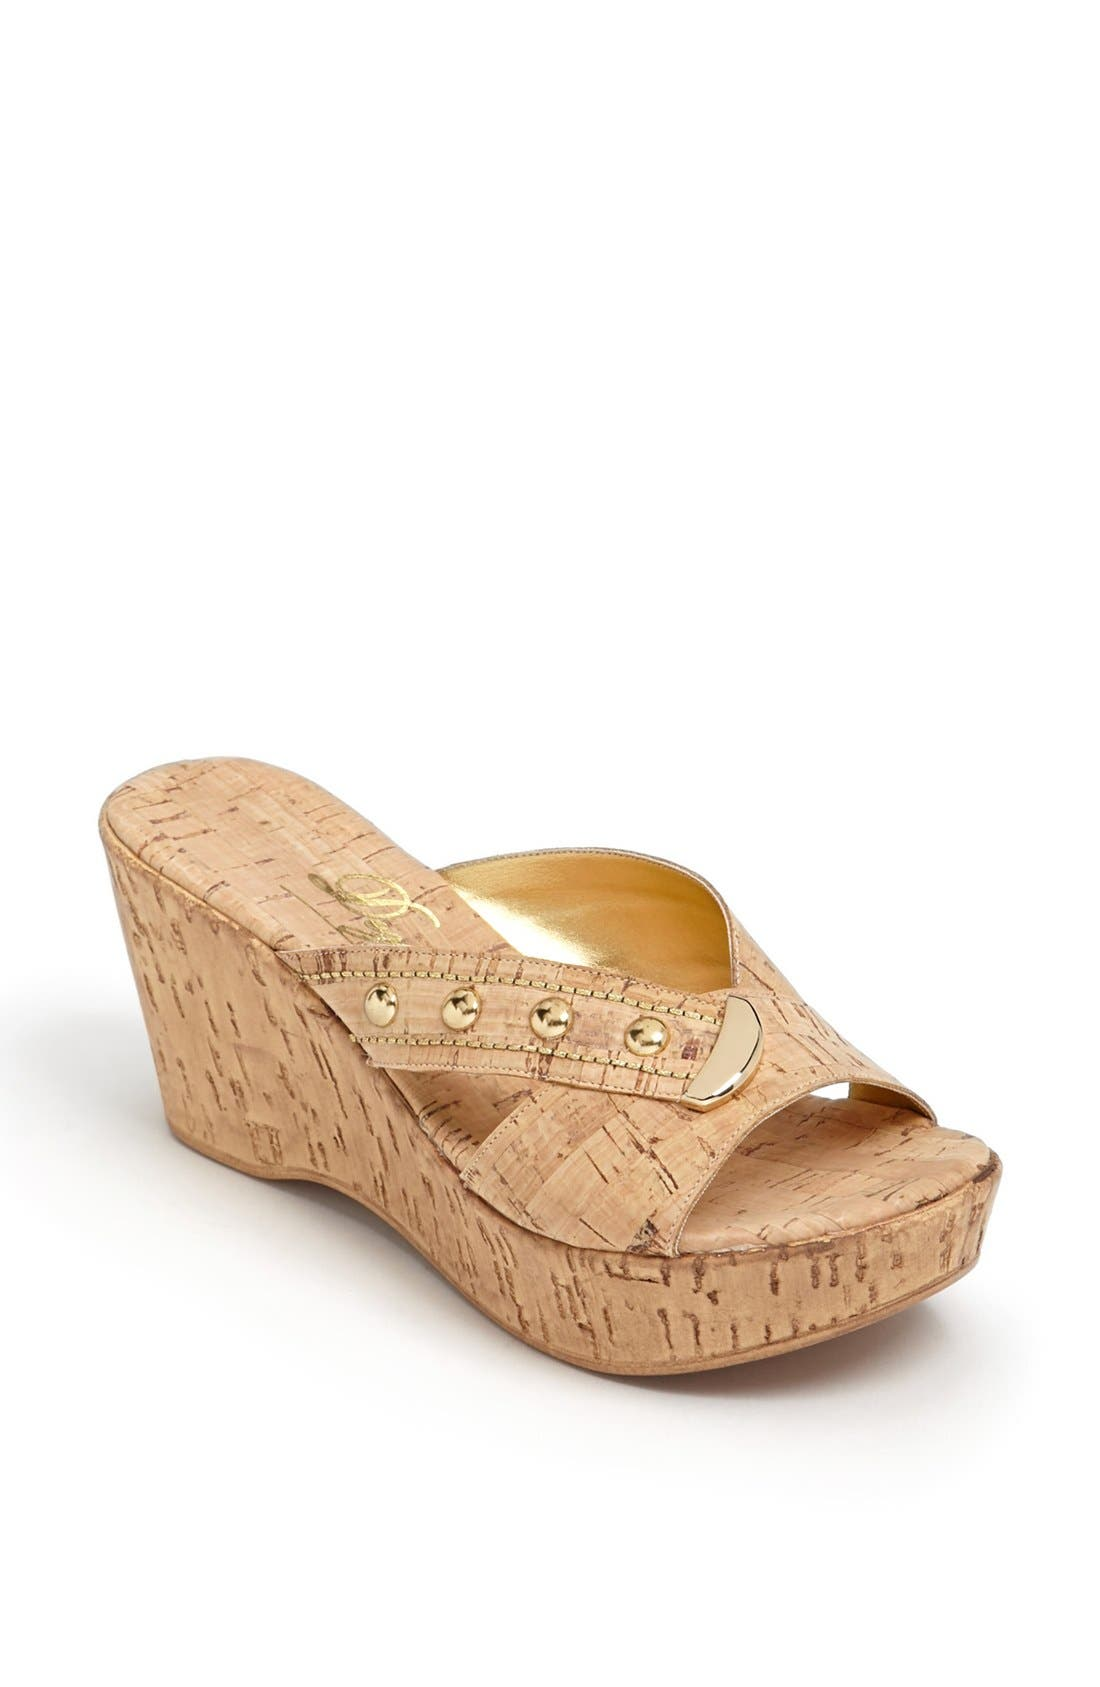 Alternate Image 1 Selected - Dezario 'Delta' Sandal